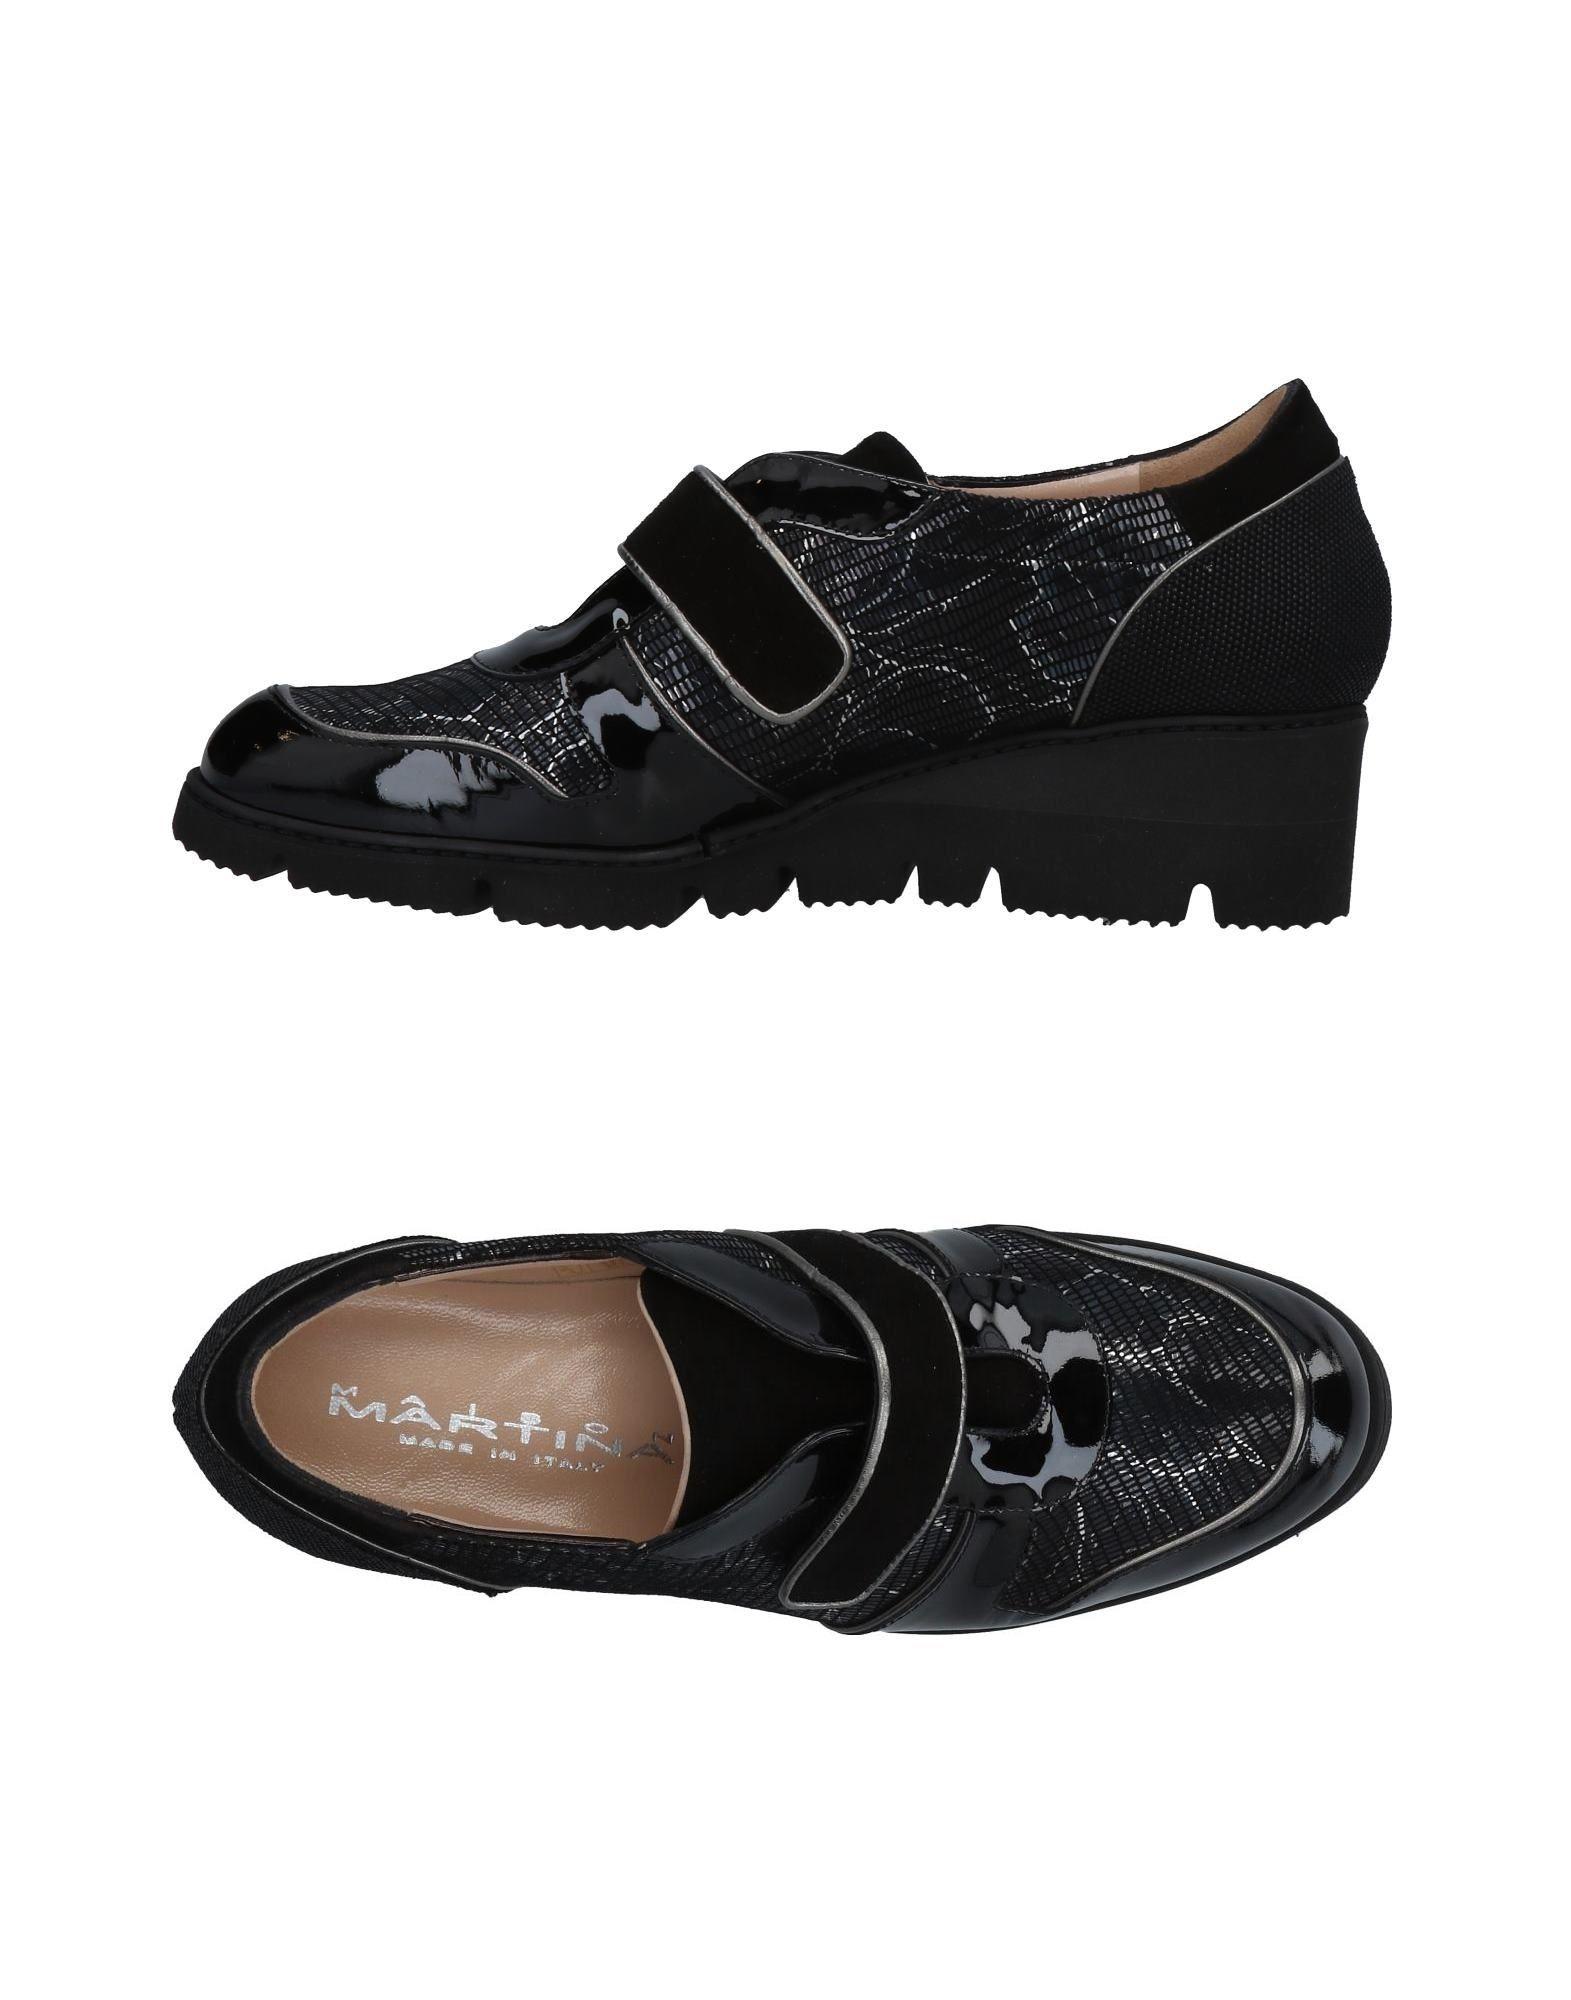 Maison Martina Sneakers - Women Maison Martina Sneakers online 11482131DP on  Australia - 11482131DP online f26638